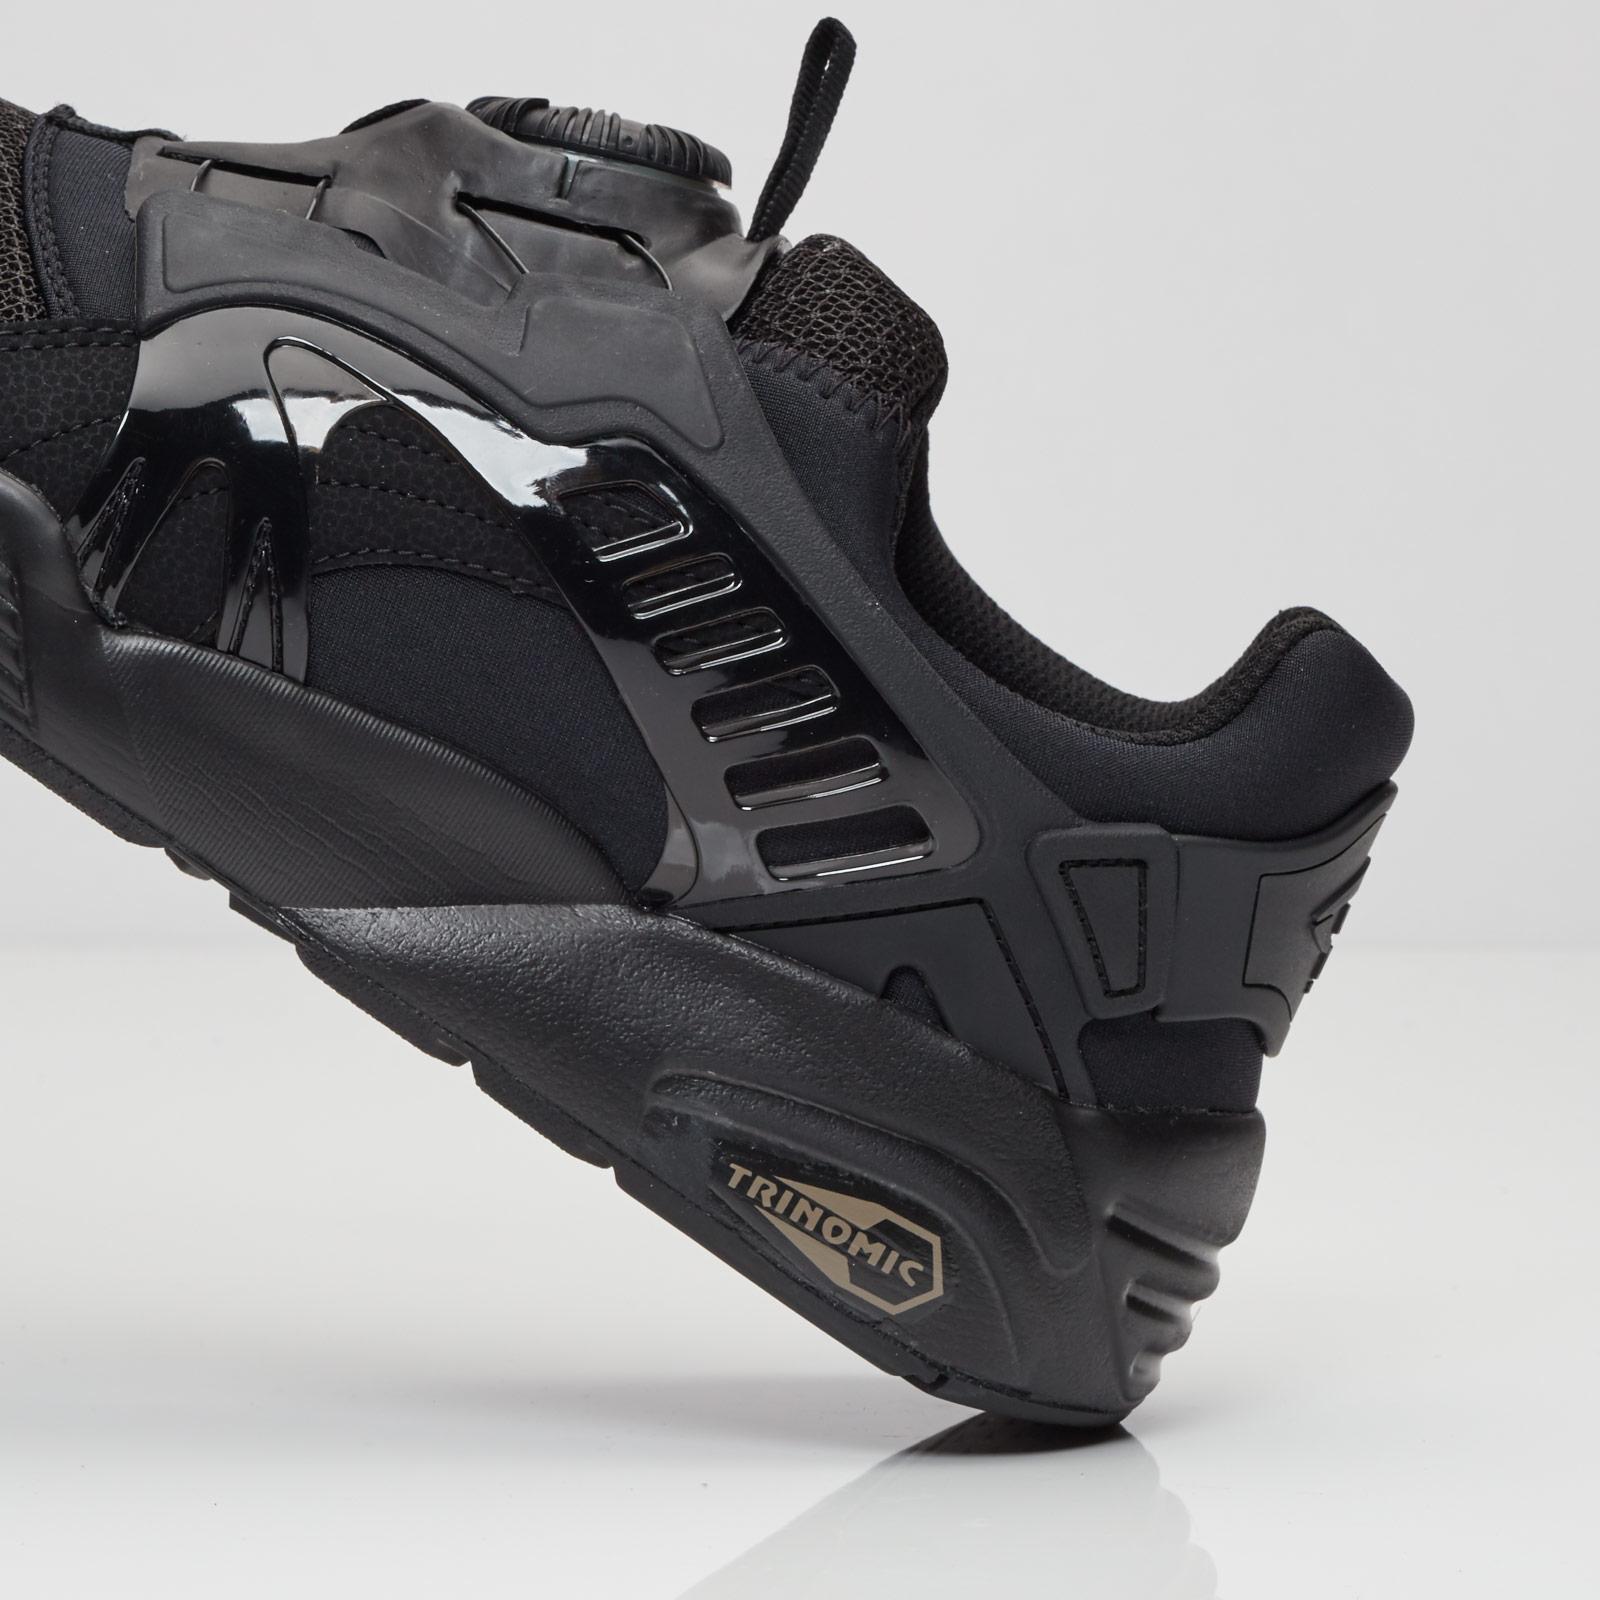 Puma Disc Blaze CT - 362040-02 - Sneakersnstuff  1e1a7ad04